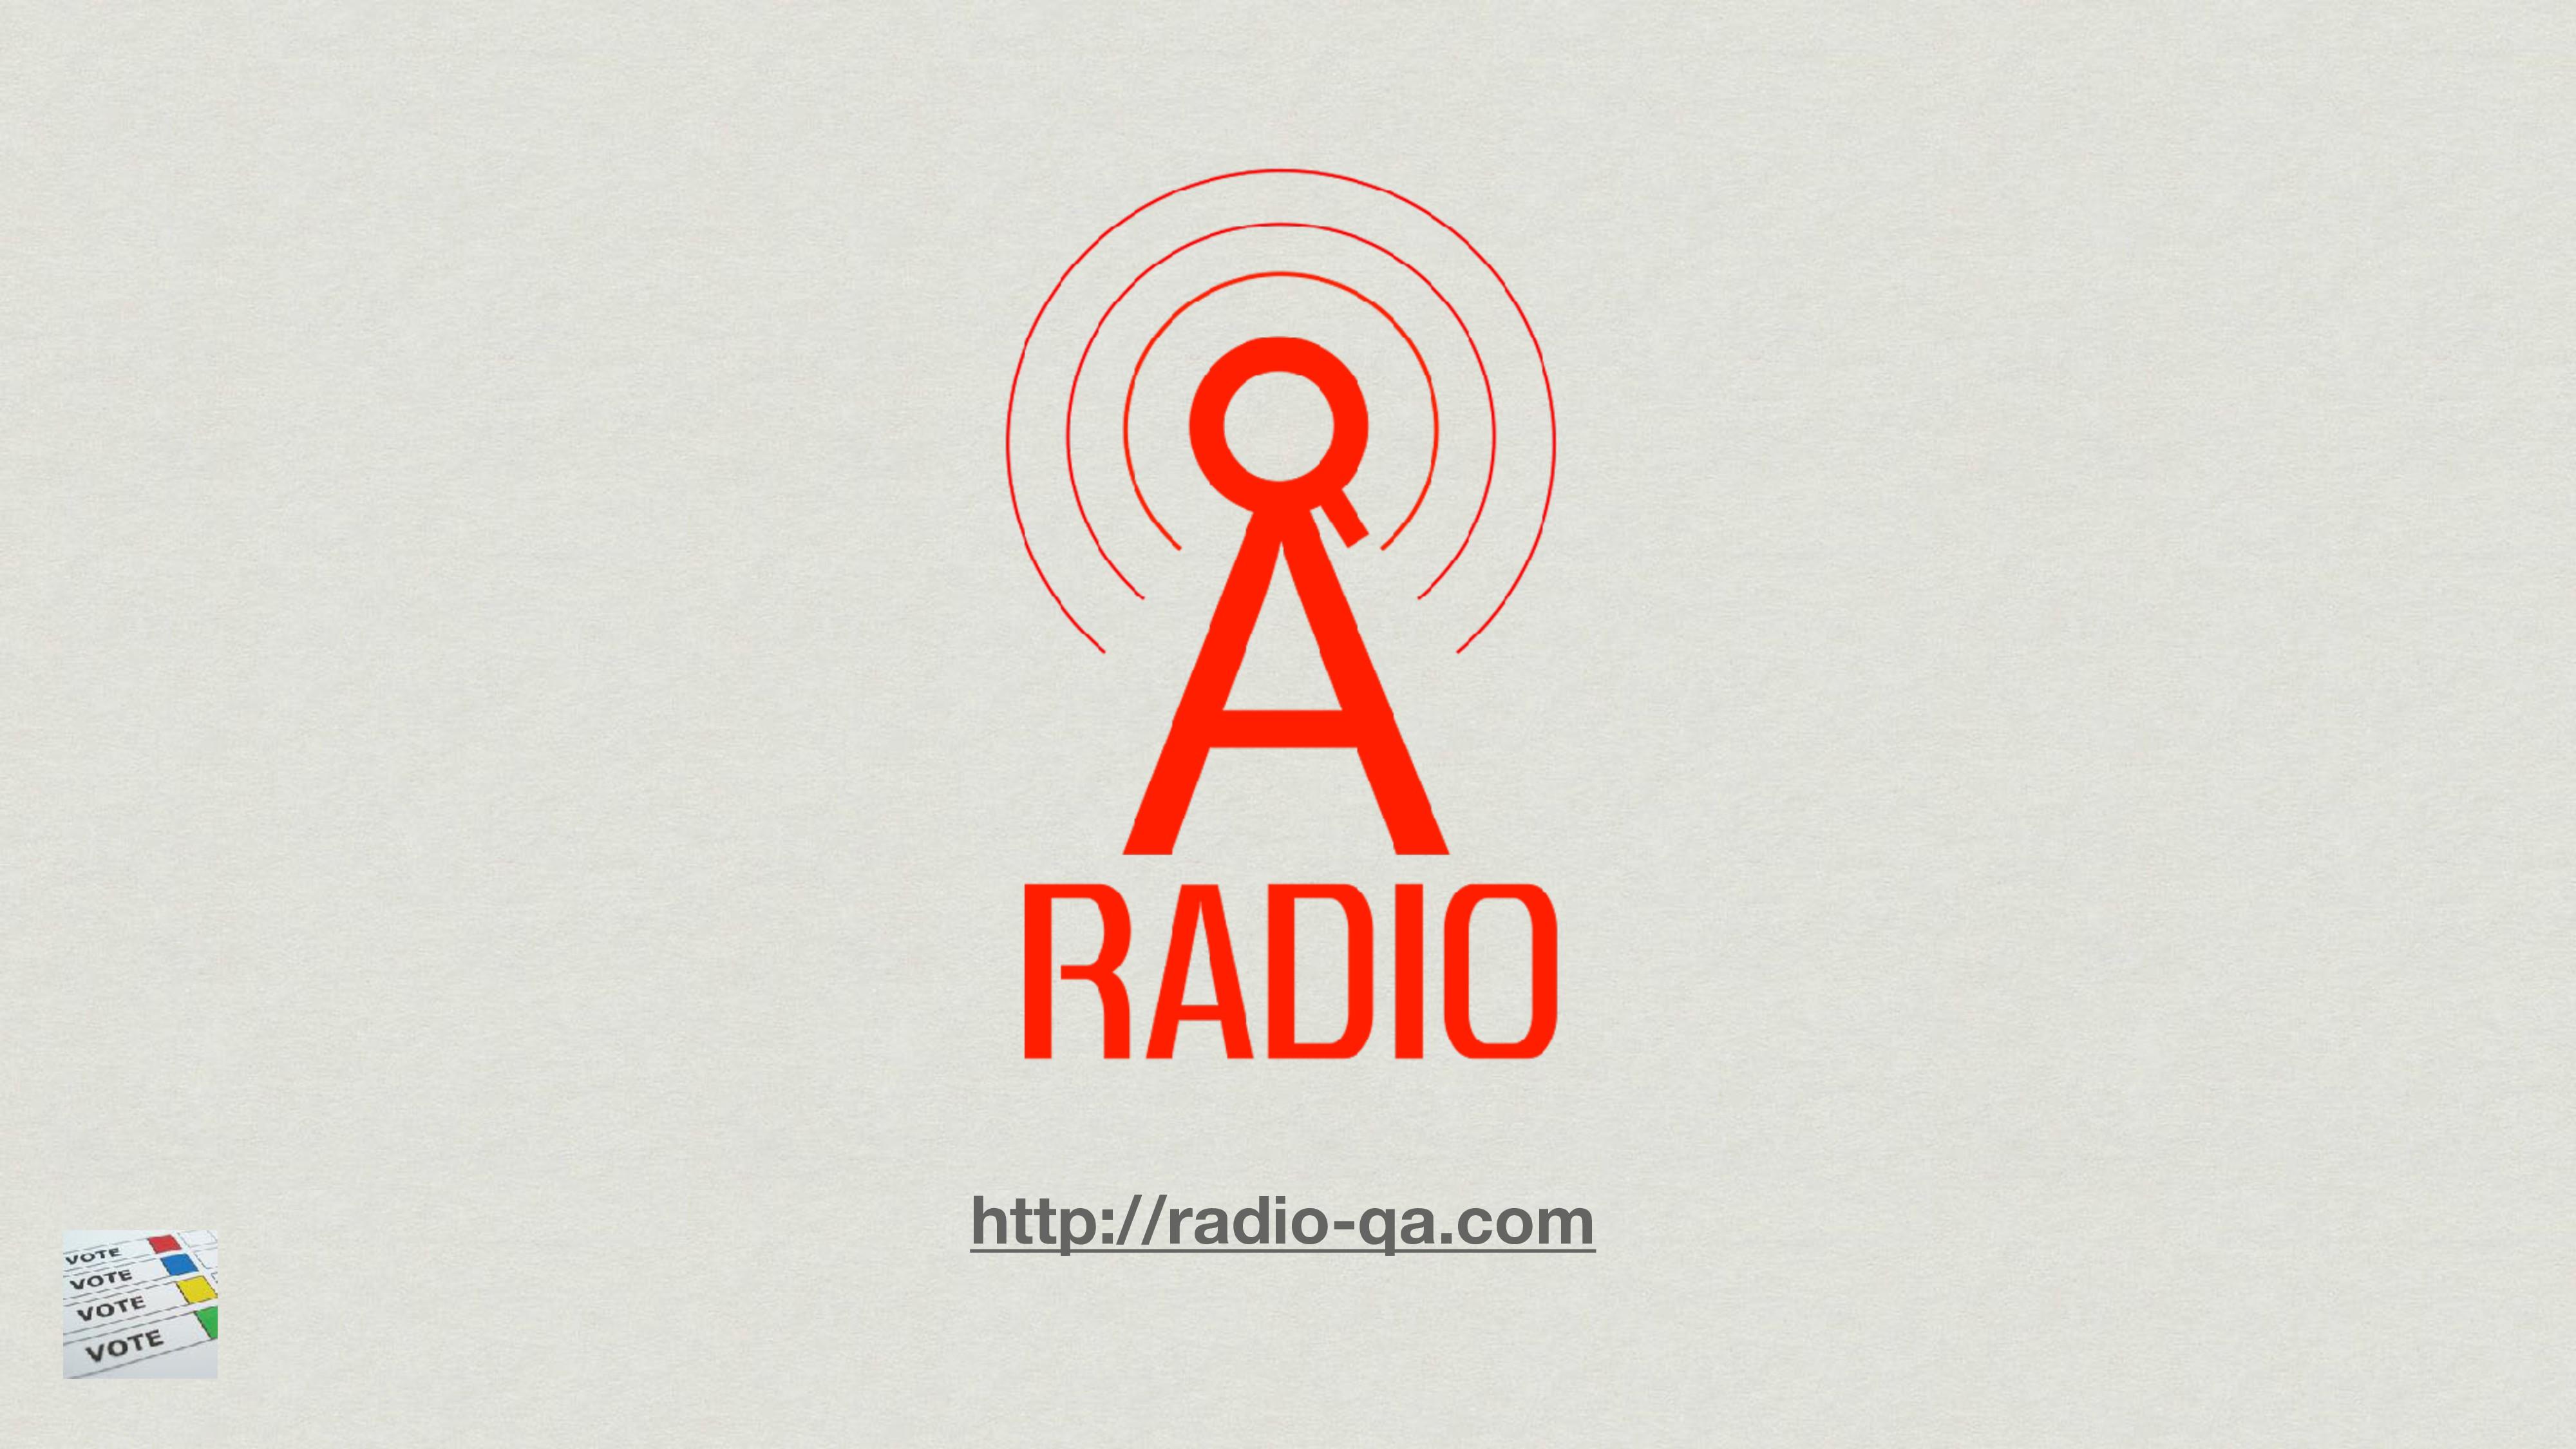 http://radio-qa.com